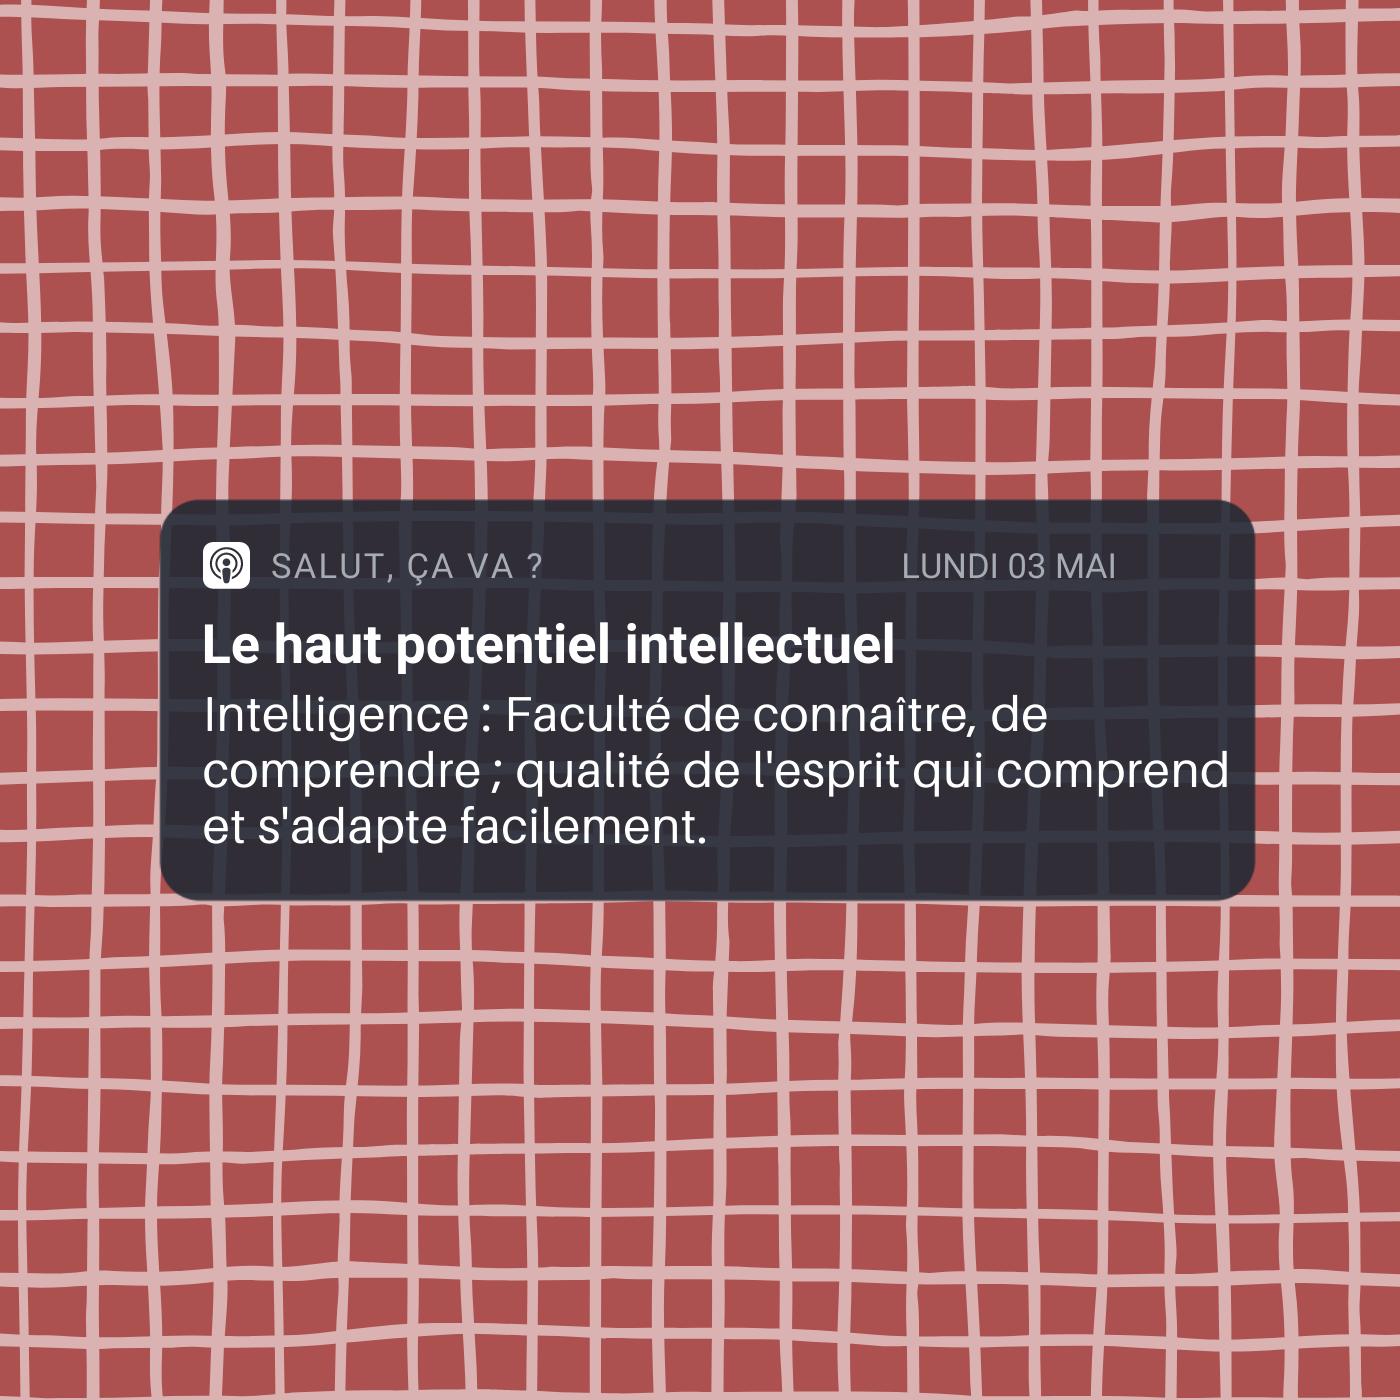 Le haut potentiel intellectuel (HPI)